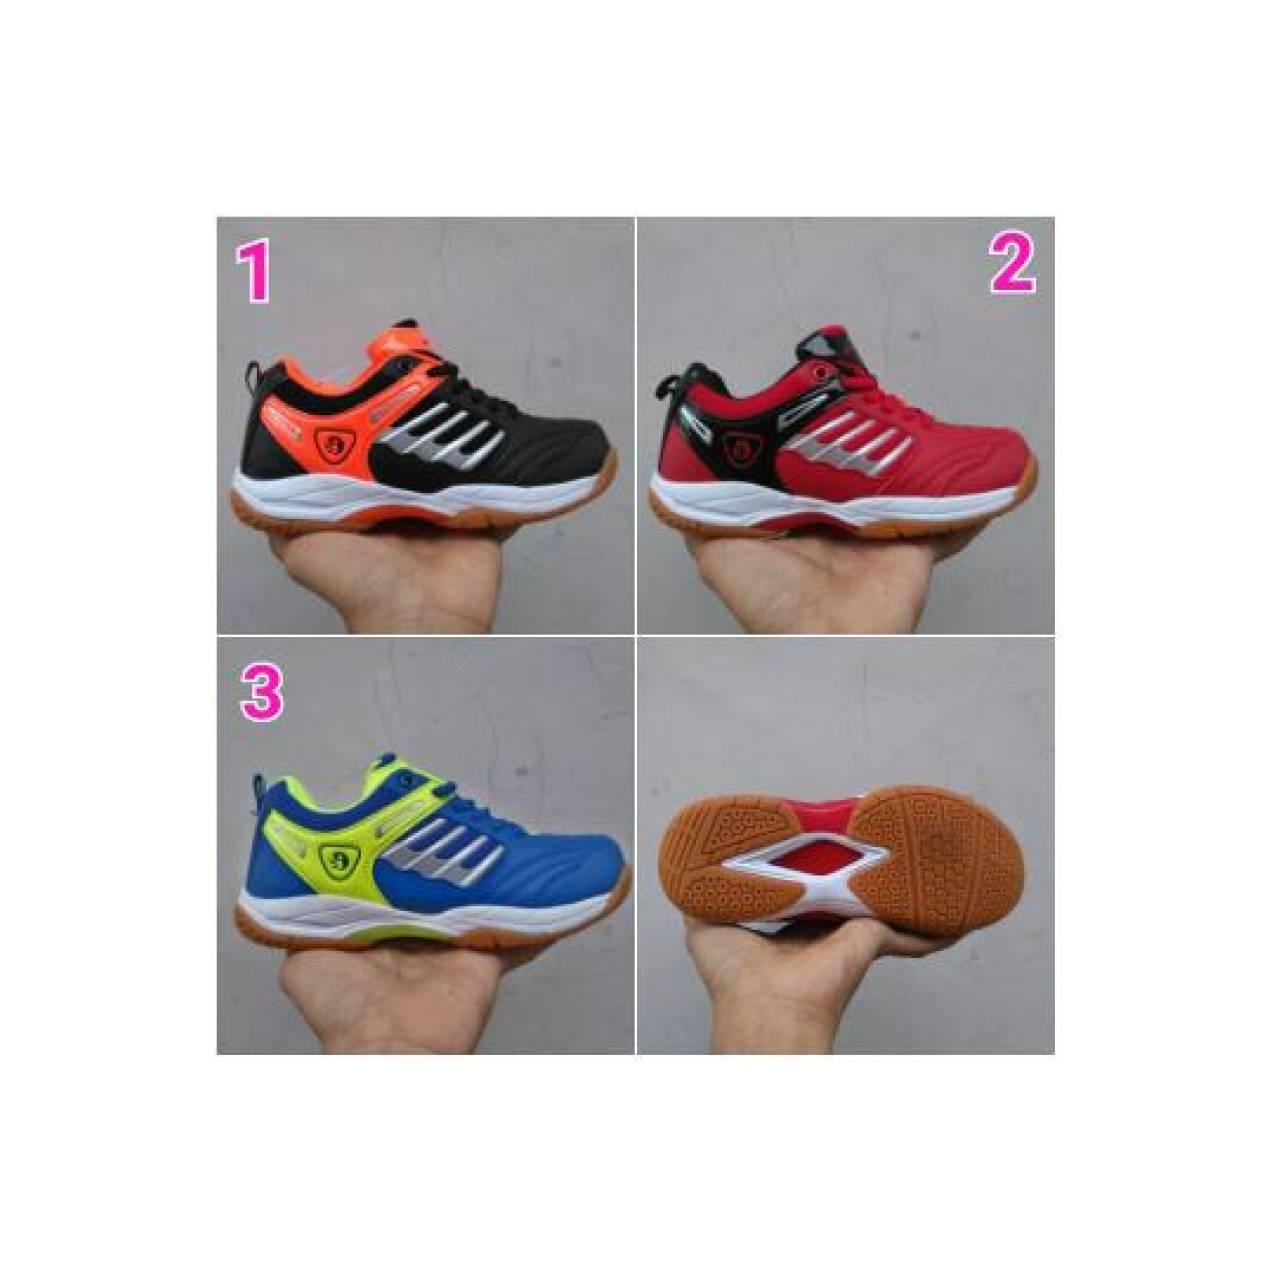 sepatu anak phoenix original buat buat voli badminton tenis pingpong d 998bcd1035